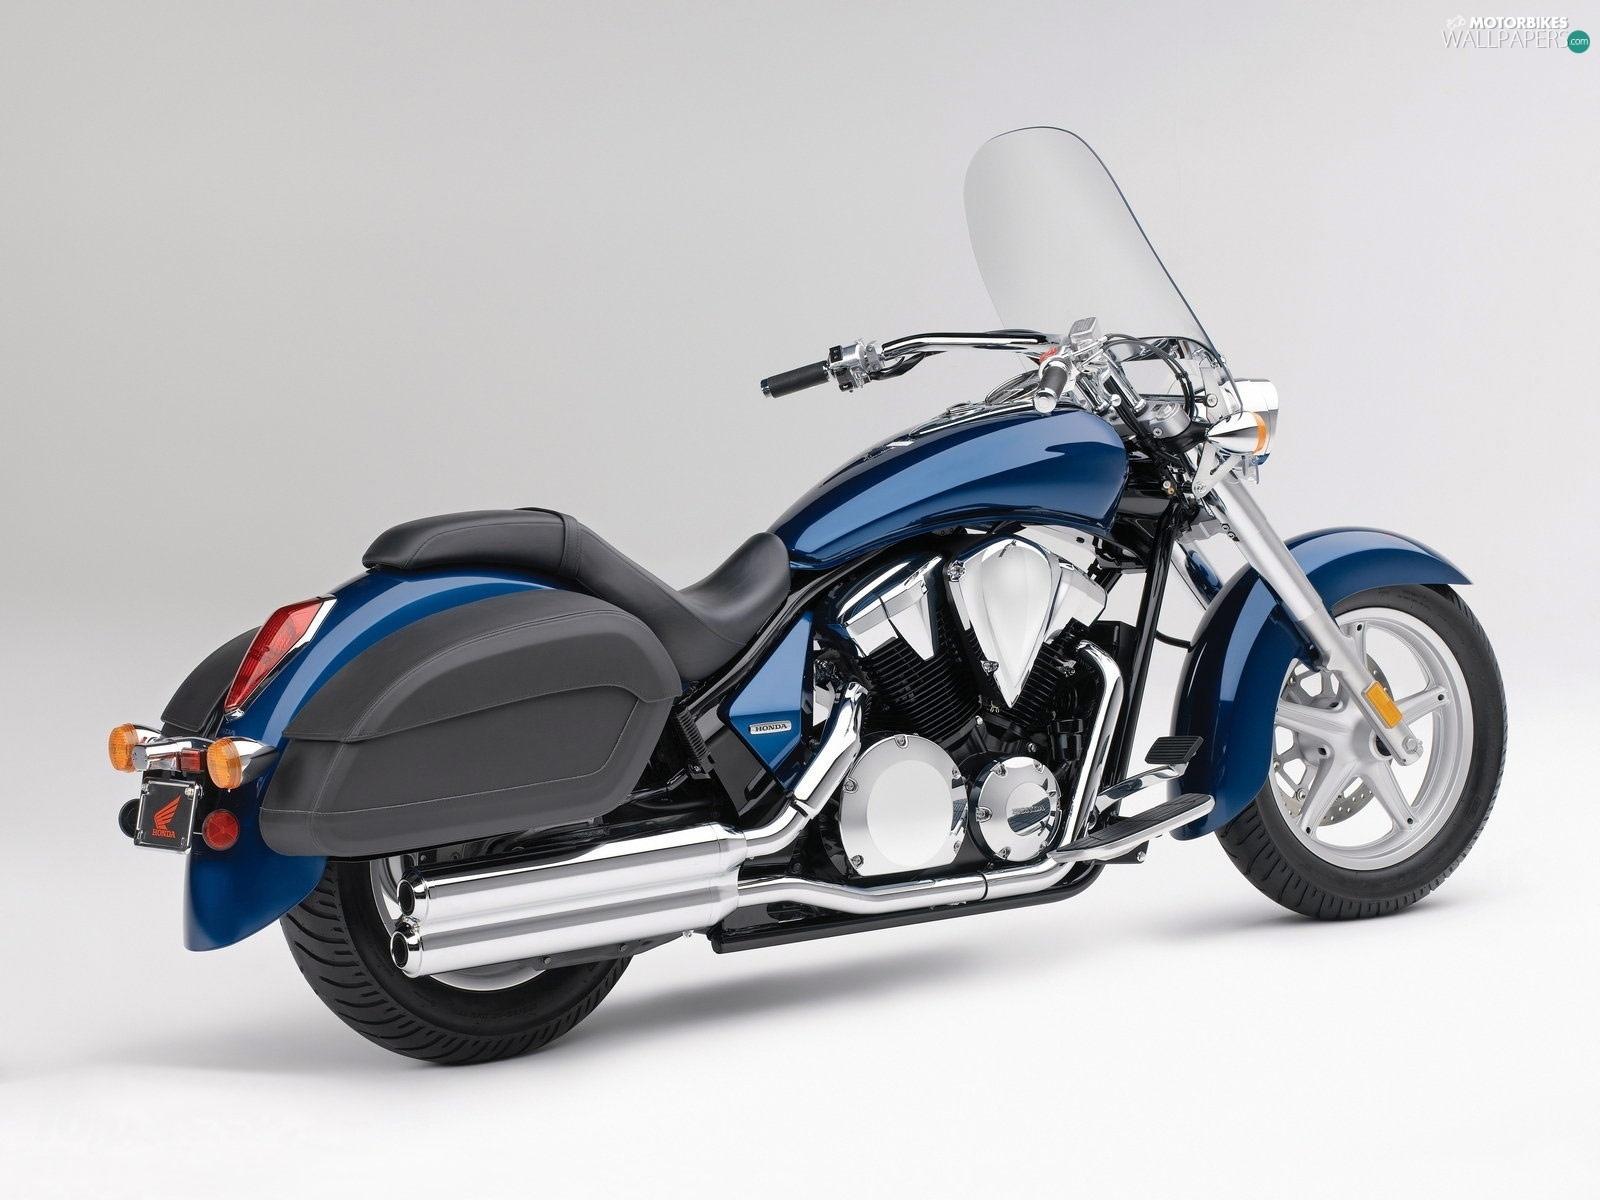 honda vtx 1300 ct interstate blue motorbikes wallpapers